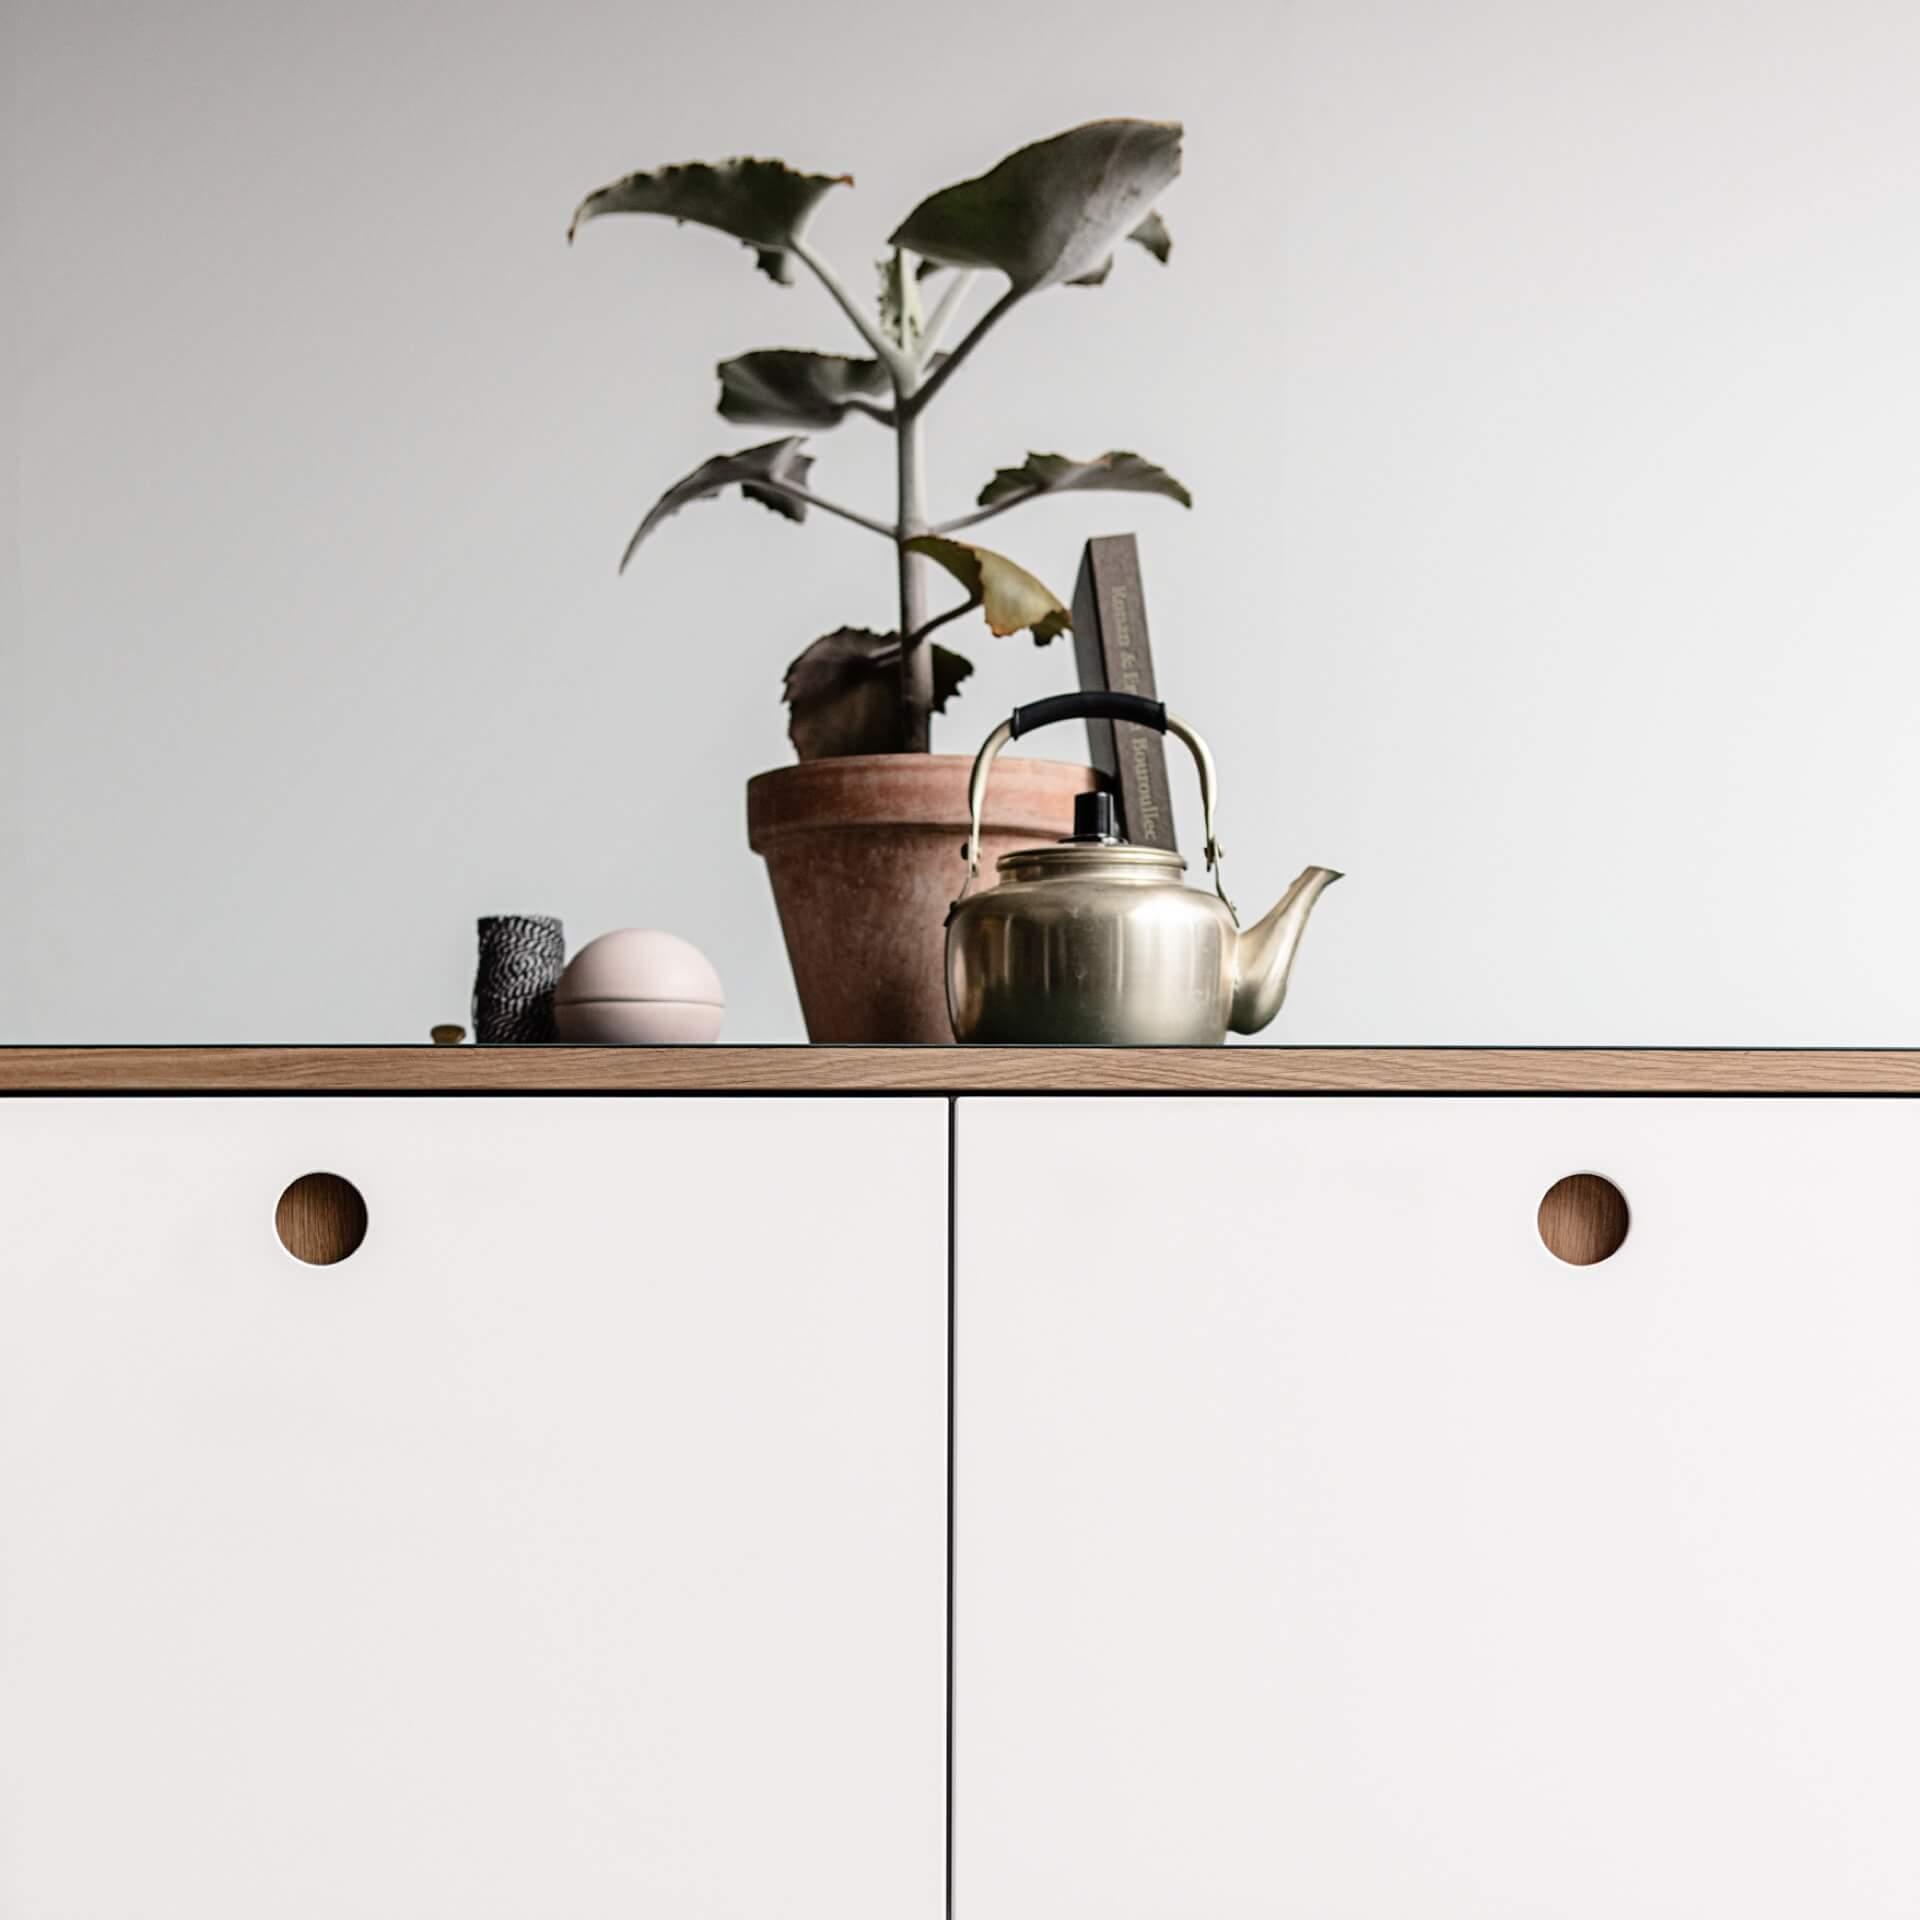 transformer meuble ikea dimension meuble de cuisine frais. Black Bedroom Furniture Sets. Home Design Ideas